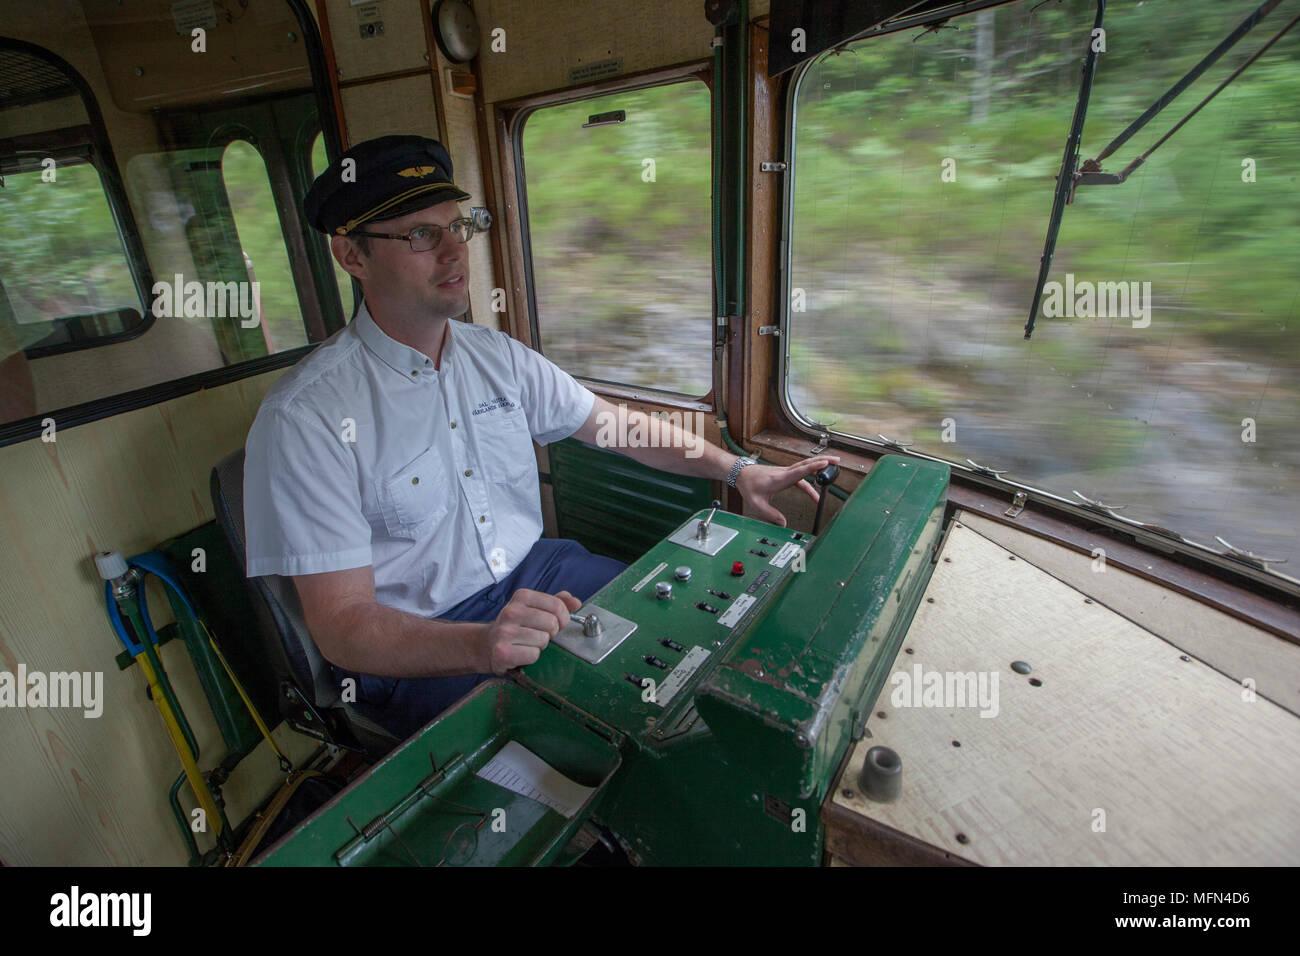 The train driver runs the rail bus, Håverud, Dalsland, Sweden. - Stock Image